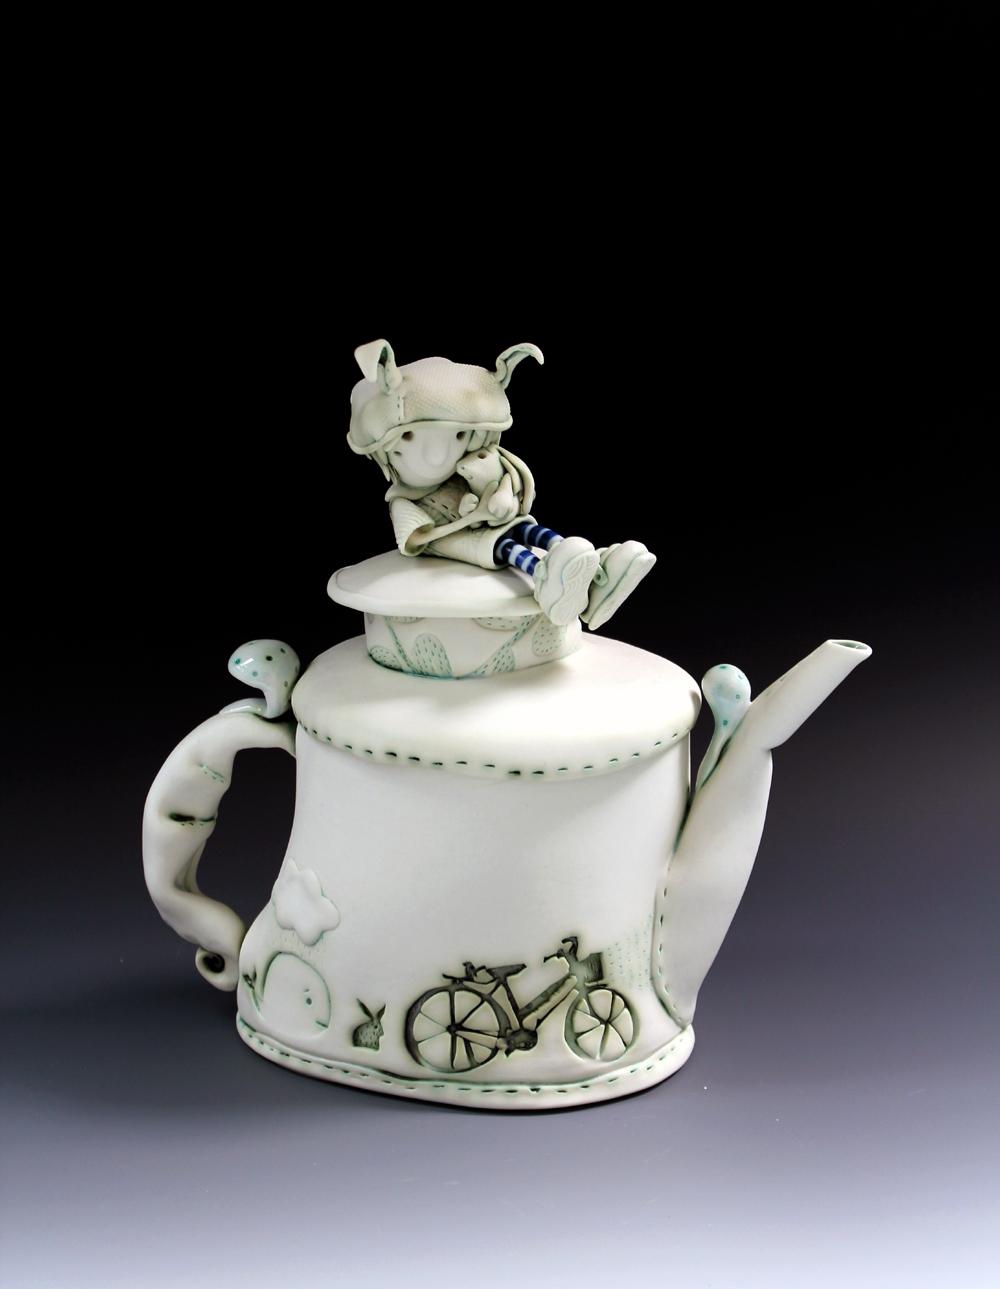 Copy of 'Heidi and Bilby' Teapot W25cm x H24cm x D12cm